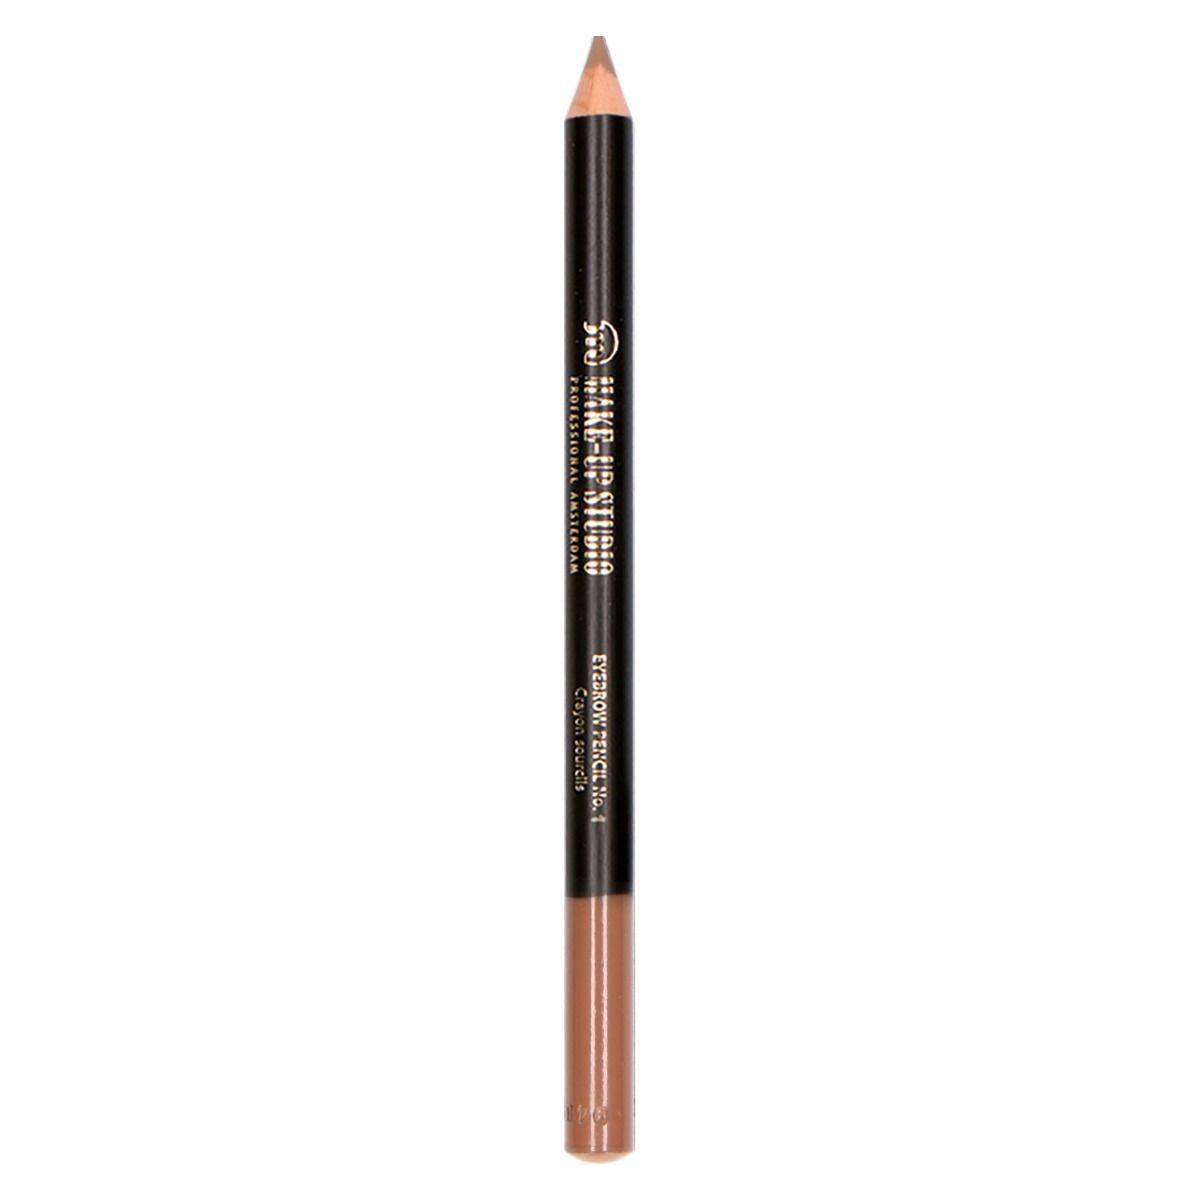 Make-up studio Pencil Eyebrow